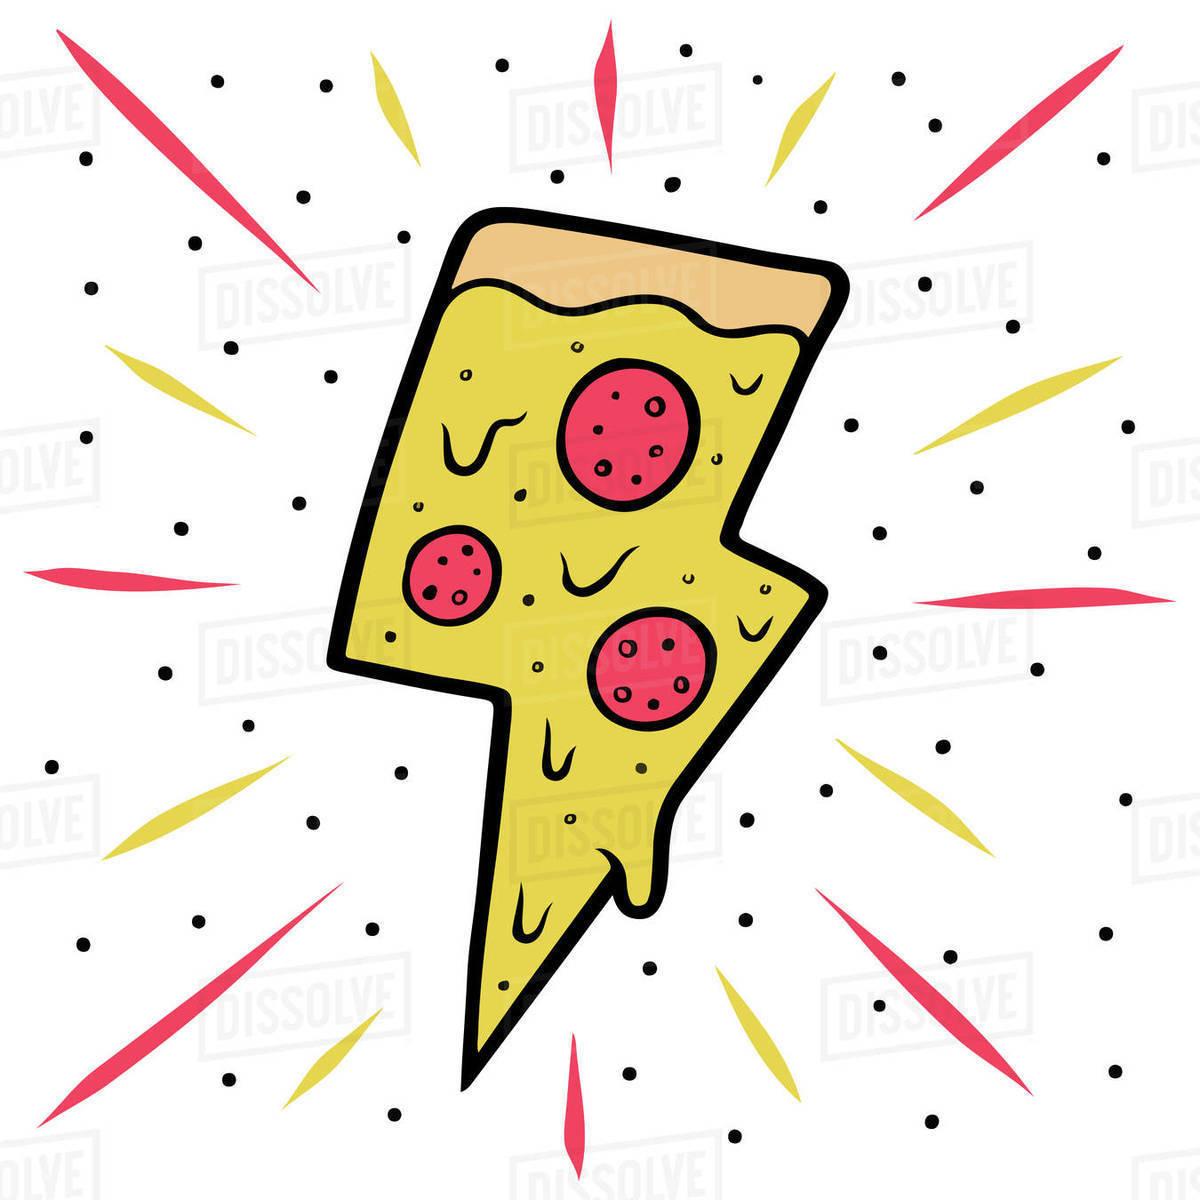 Illustration of sparkling pizza slice isolated on white background Royalty-free stock photo